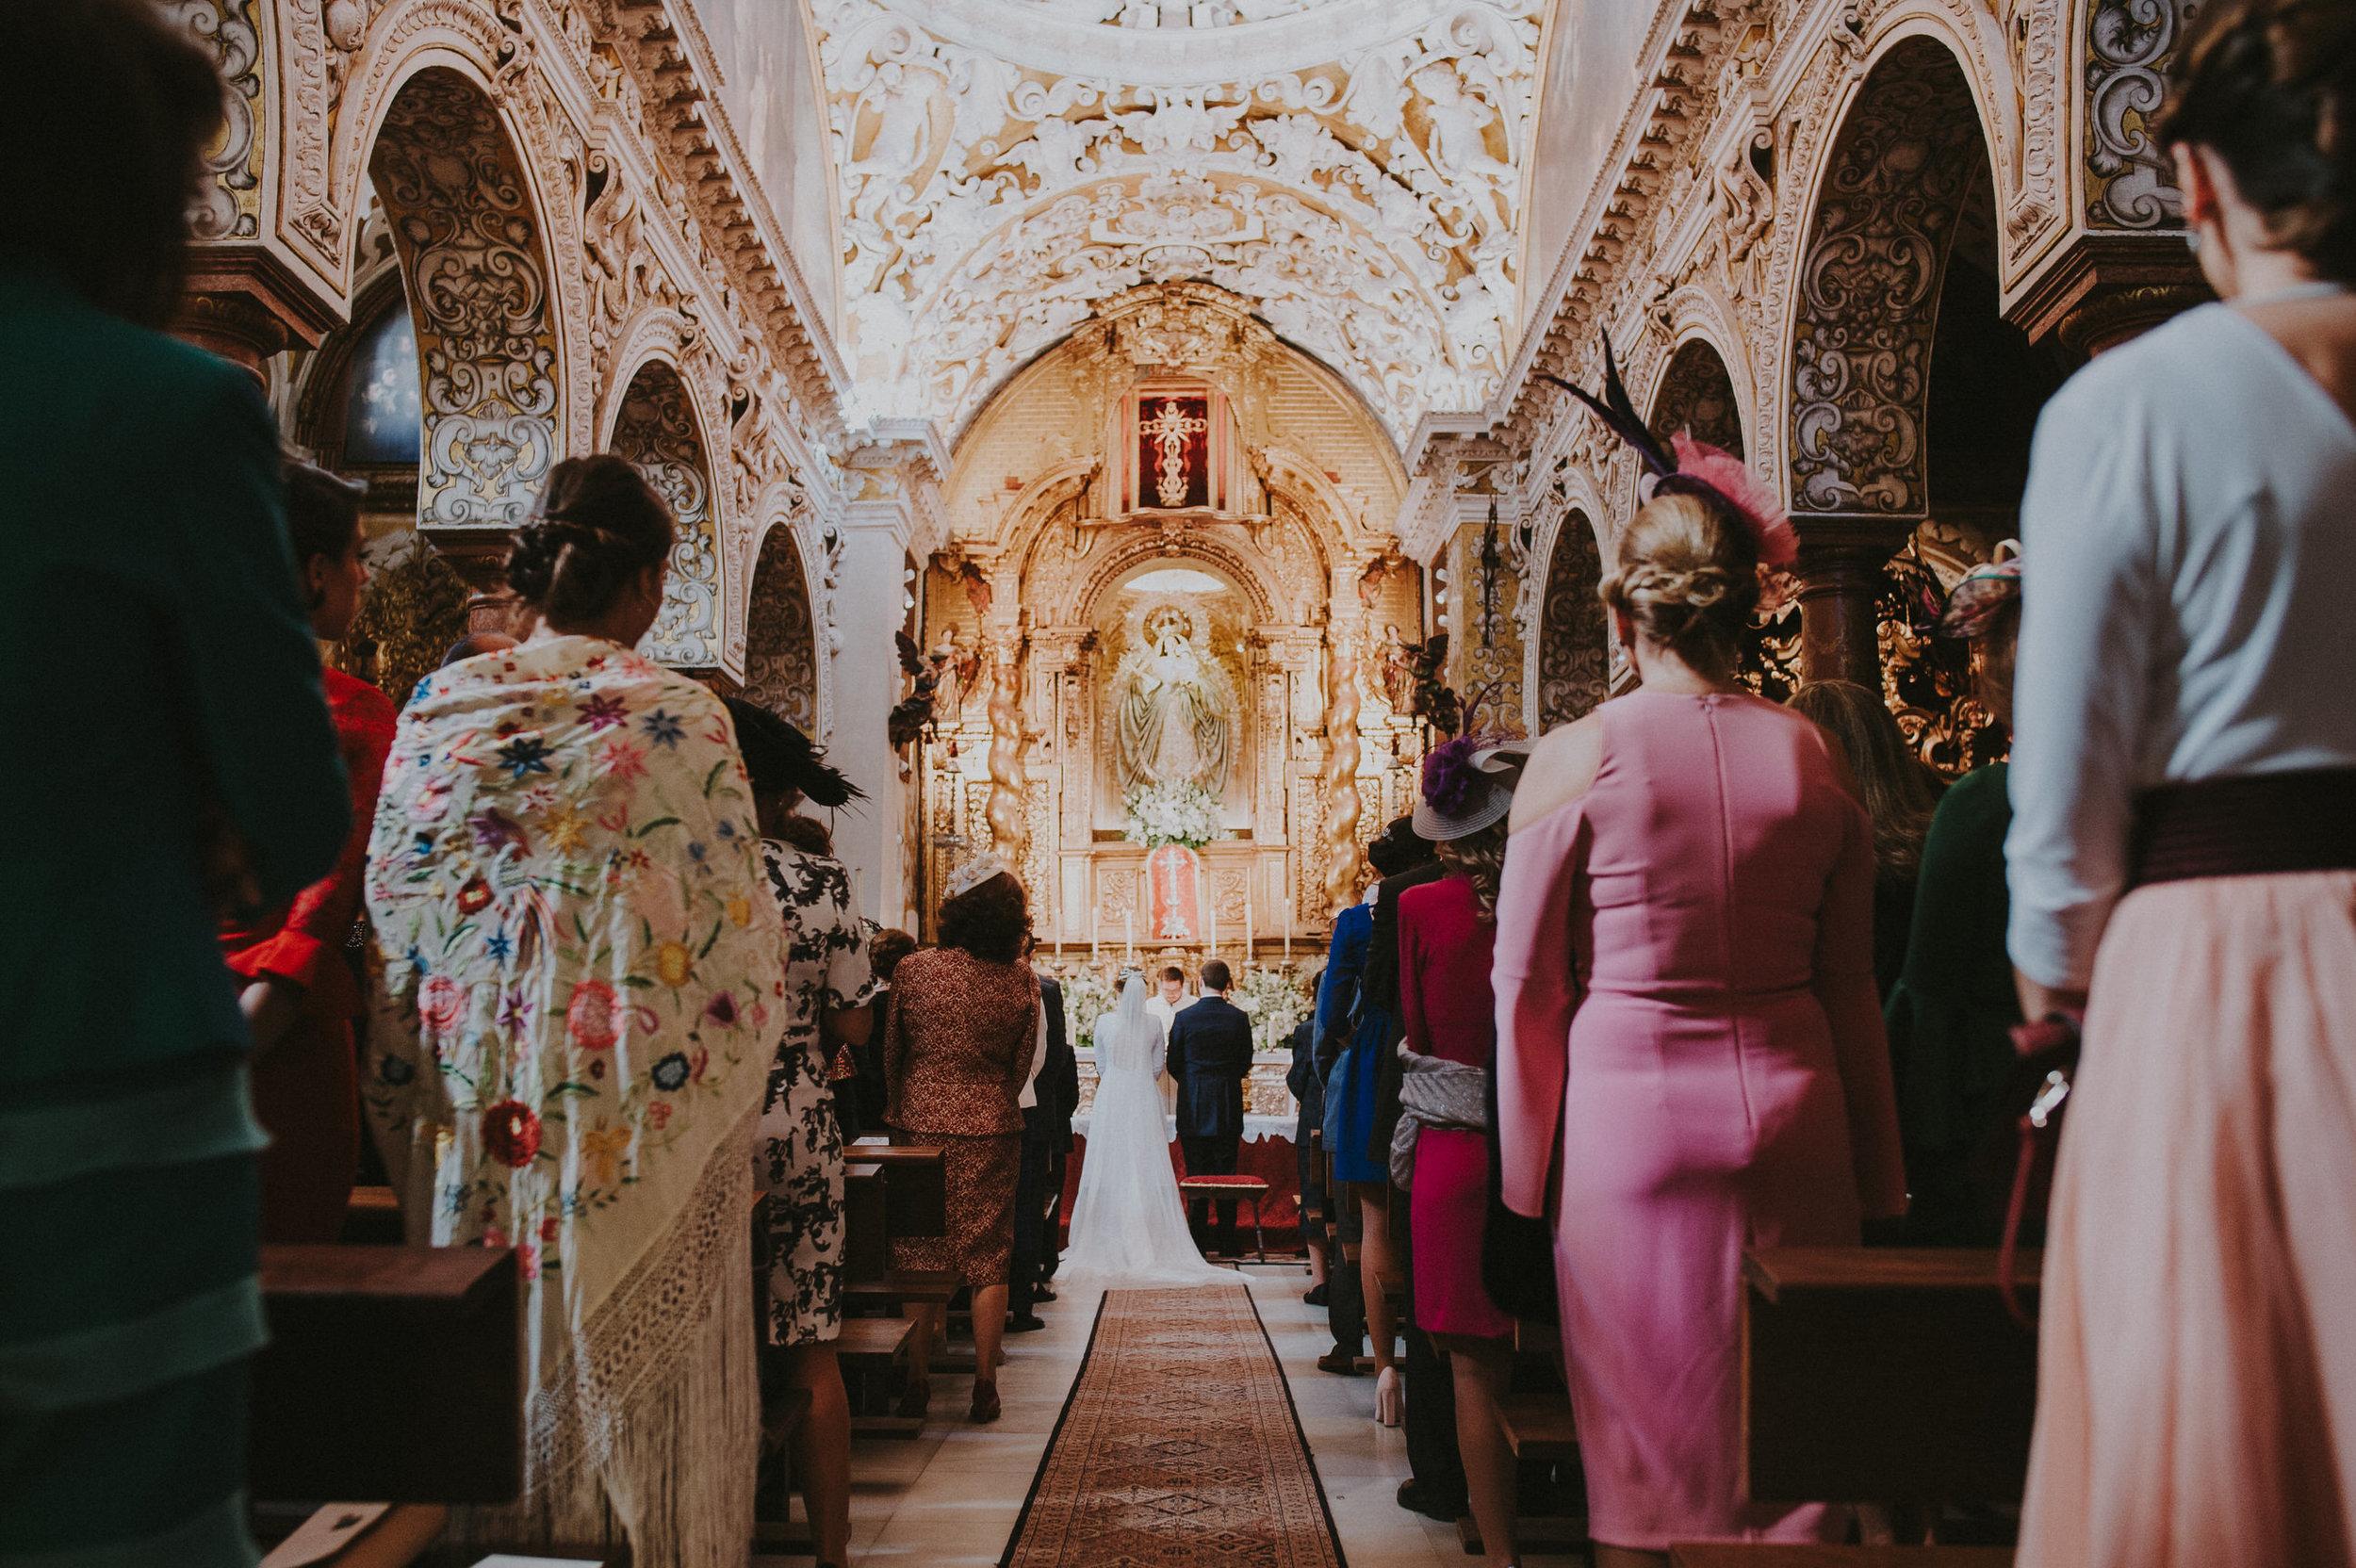 andres+amarillo+fotografo+boda+sevilla+santa+maria+de+la+blanca+al+yamanah (46).JPG